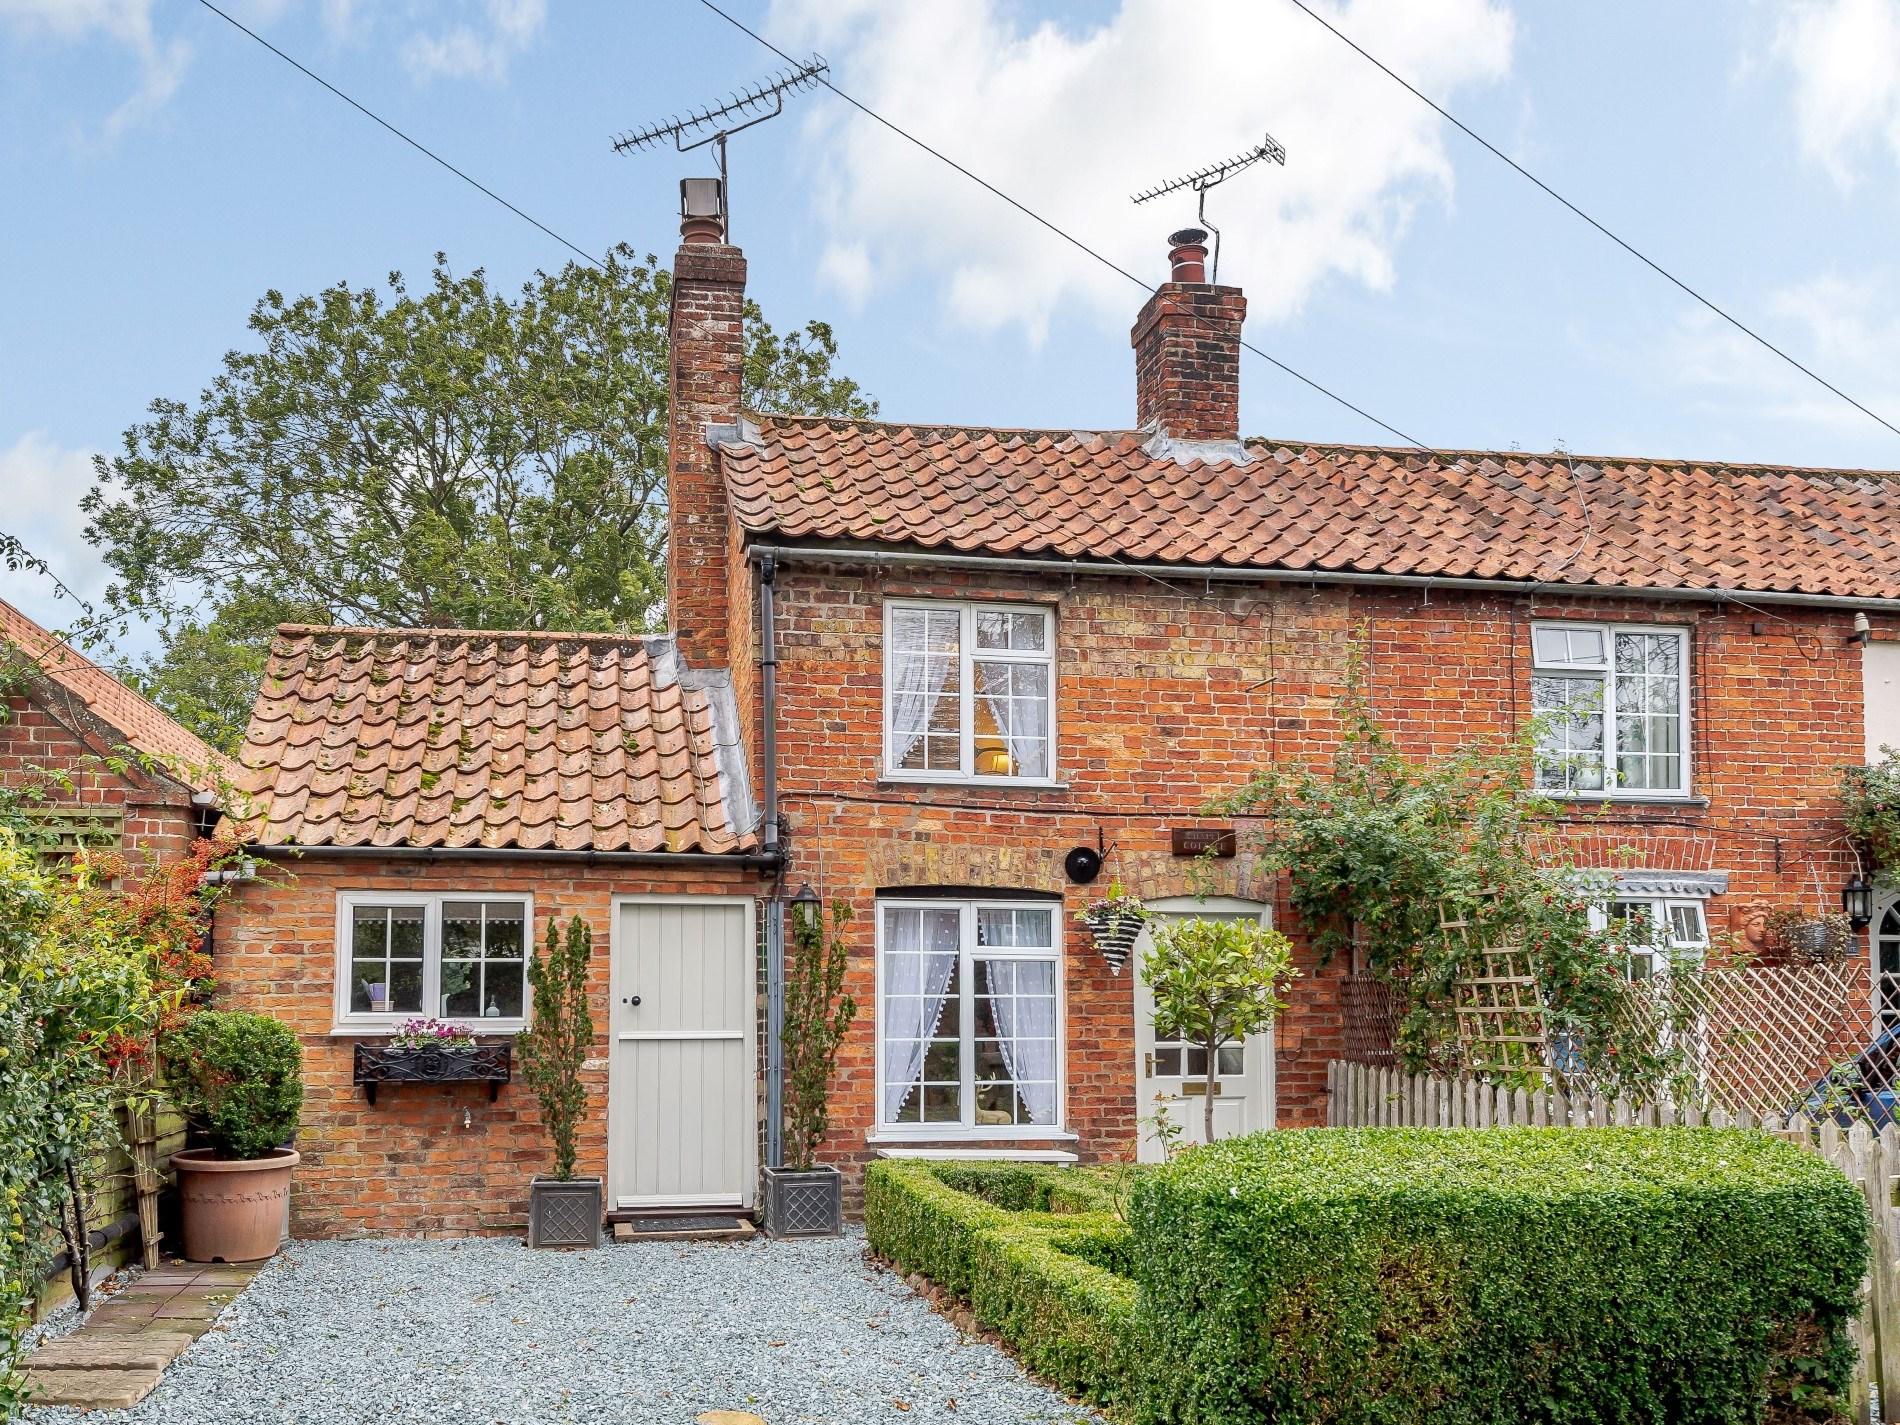 1 Bedroom Cottage in Spilsby, East of England